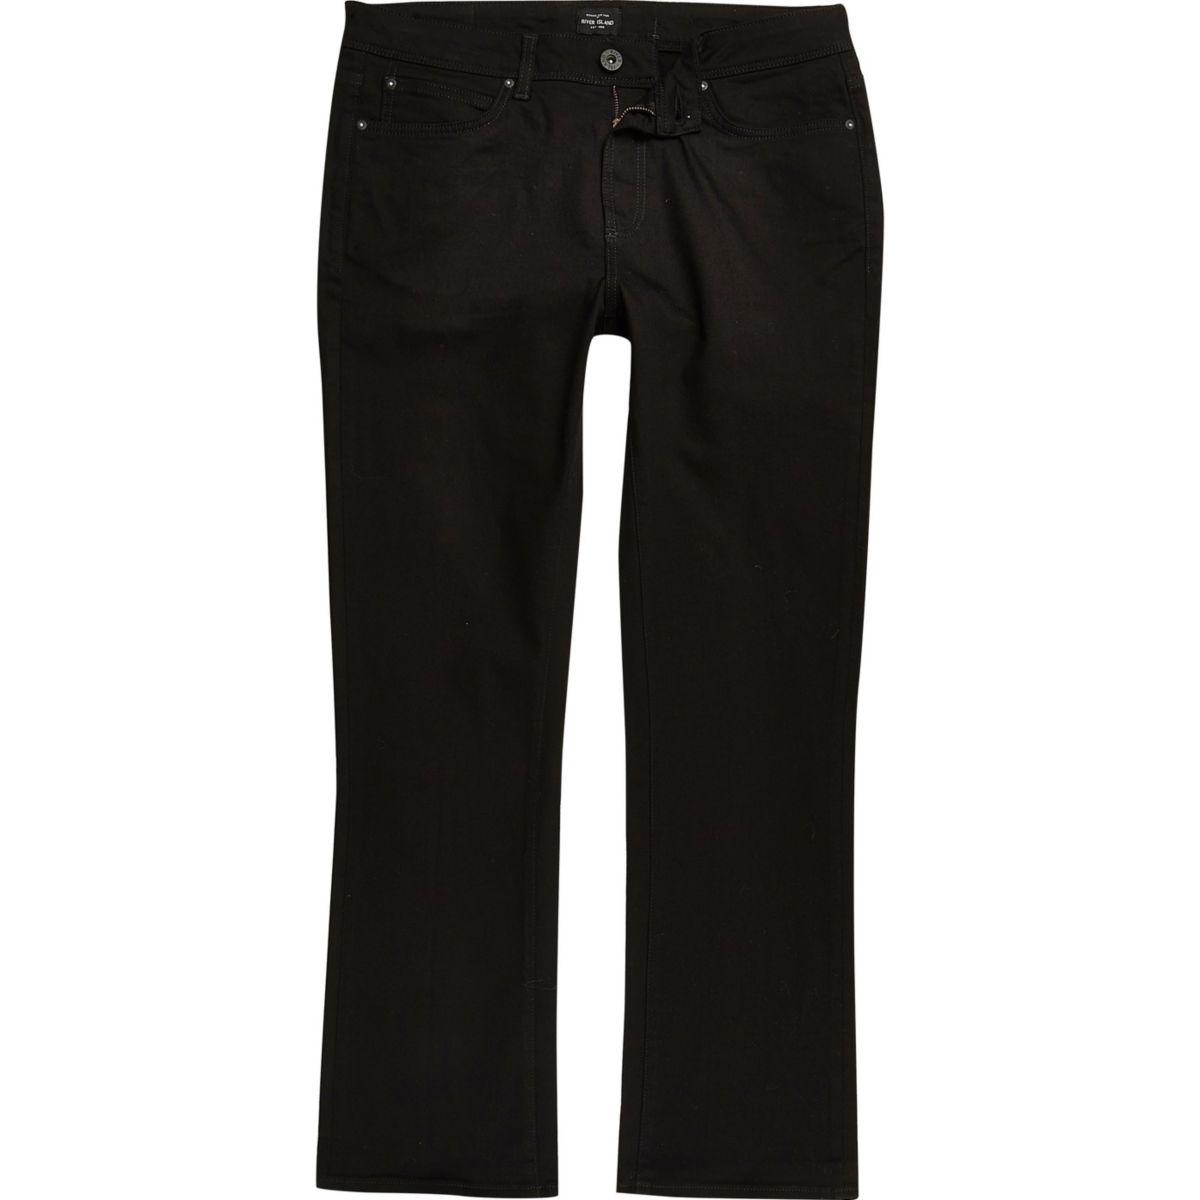 RI Big and Tall - Clint - Zwarte bootcut jeans